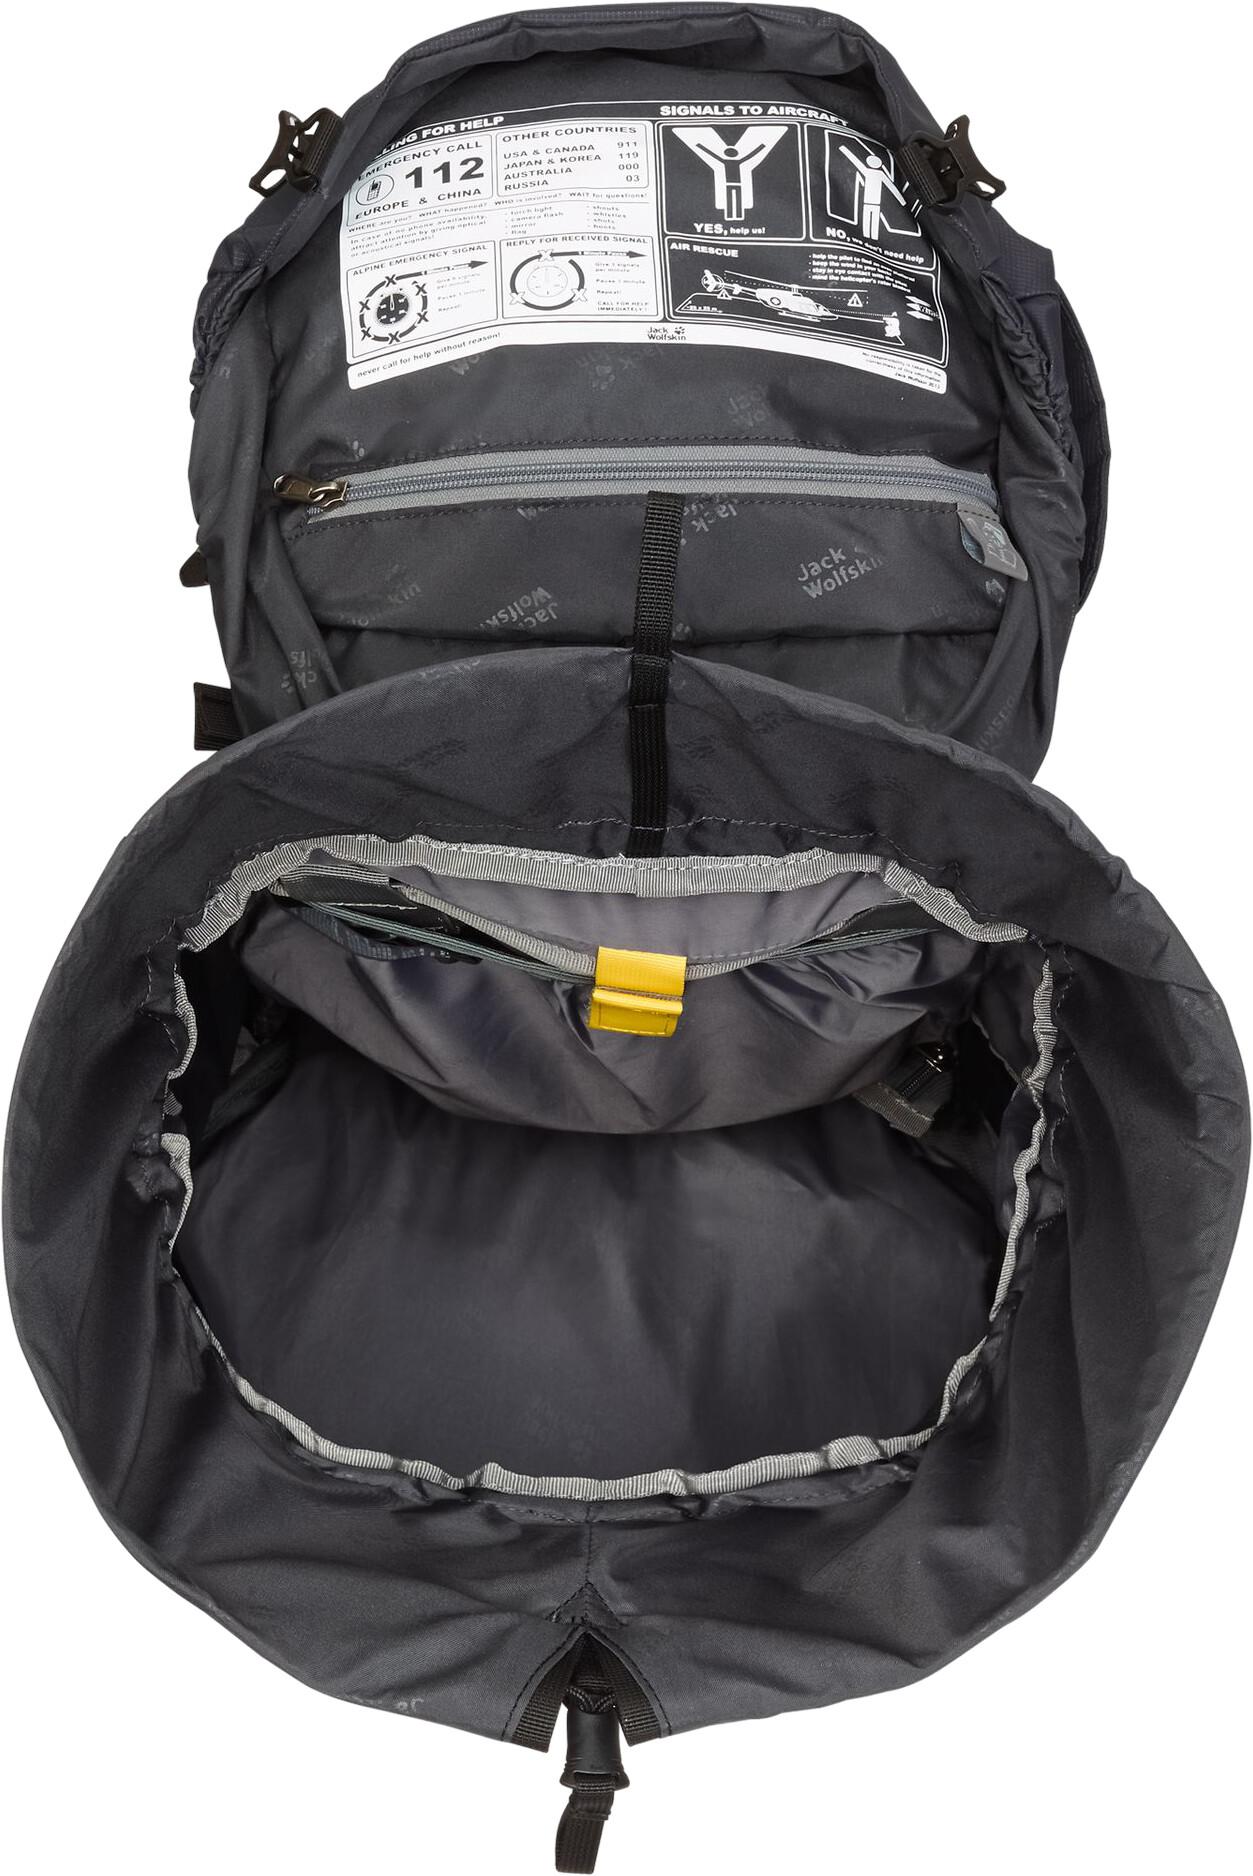 89ad9423b8f Jack Wolfskin Highland Trail XT 50 Backpack grey at Addnature.co.uk